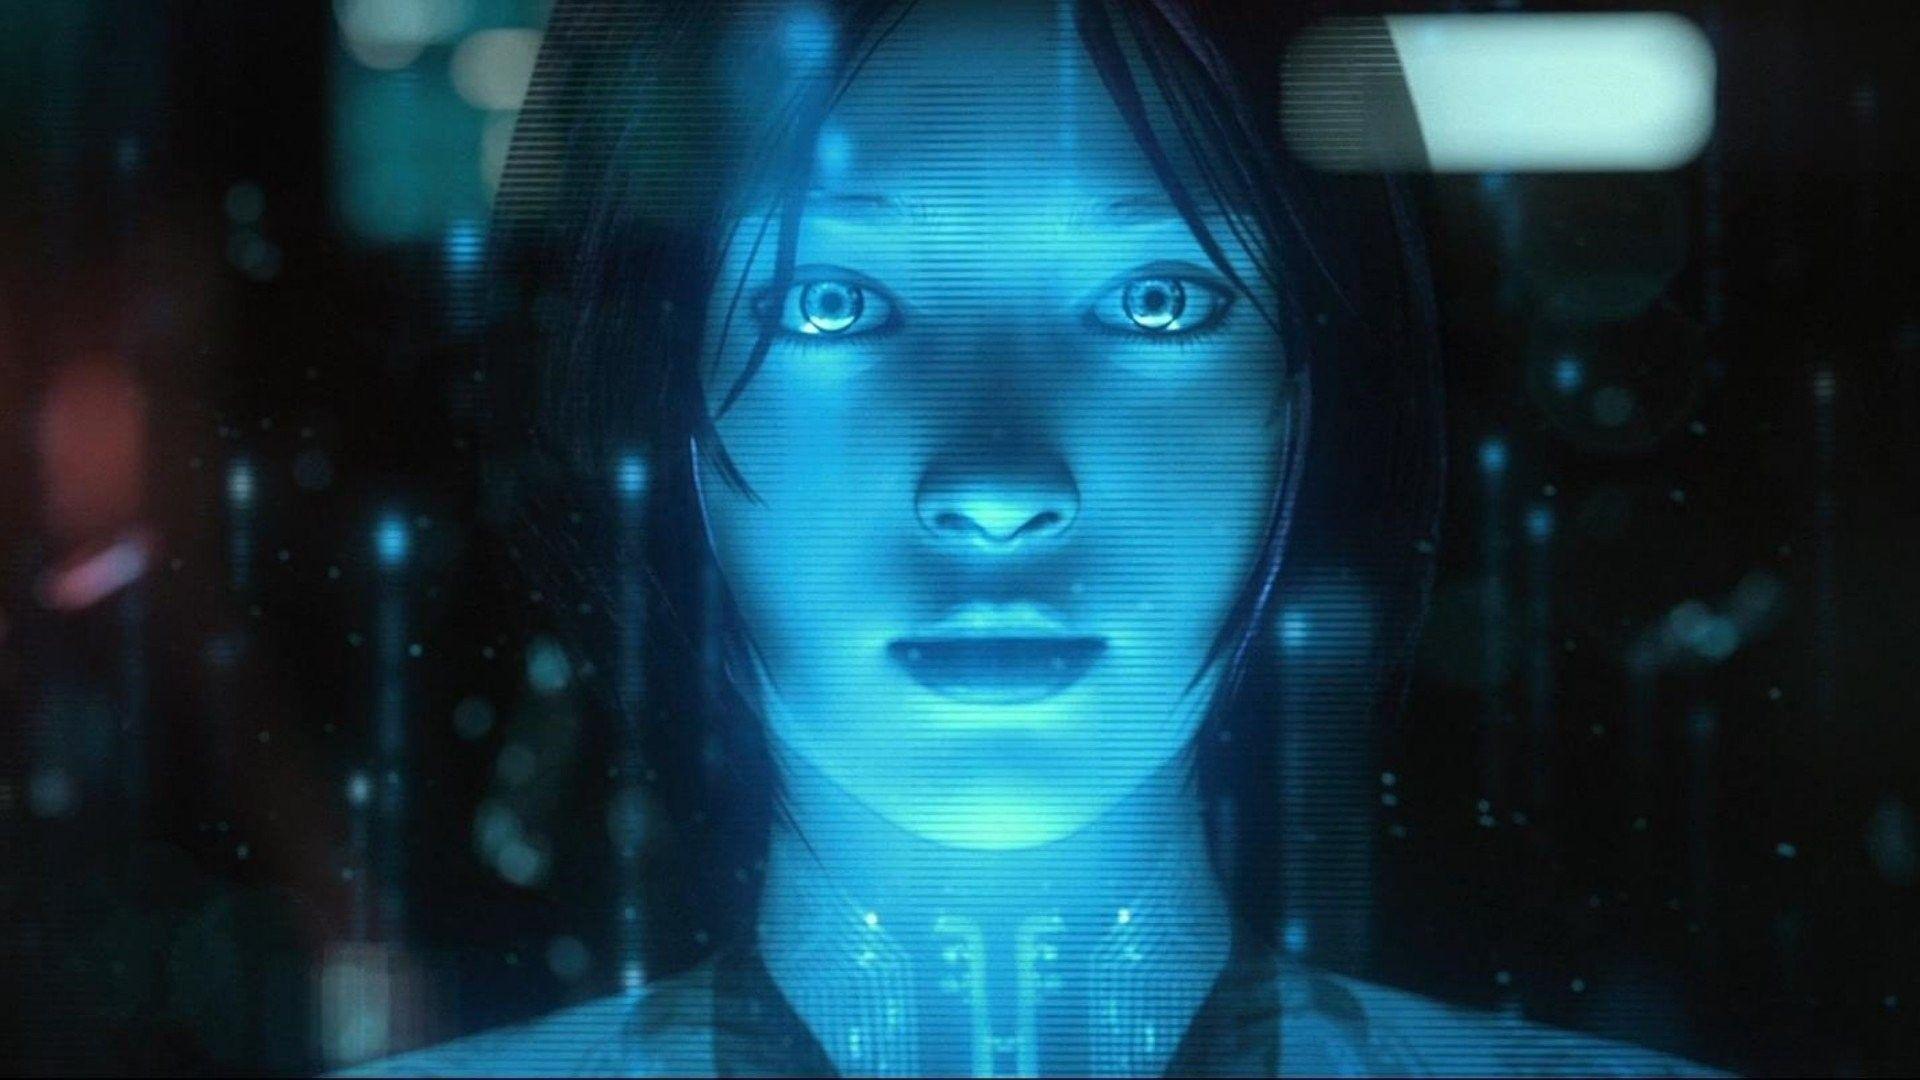 Cortana 4K Wallpapers   Top Cortana 4K Backgrounds 1920x1080